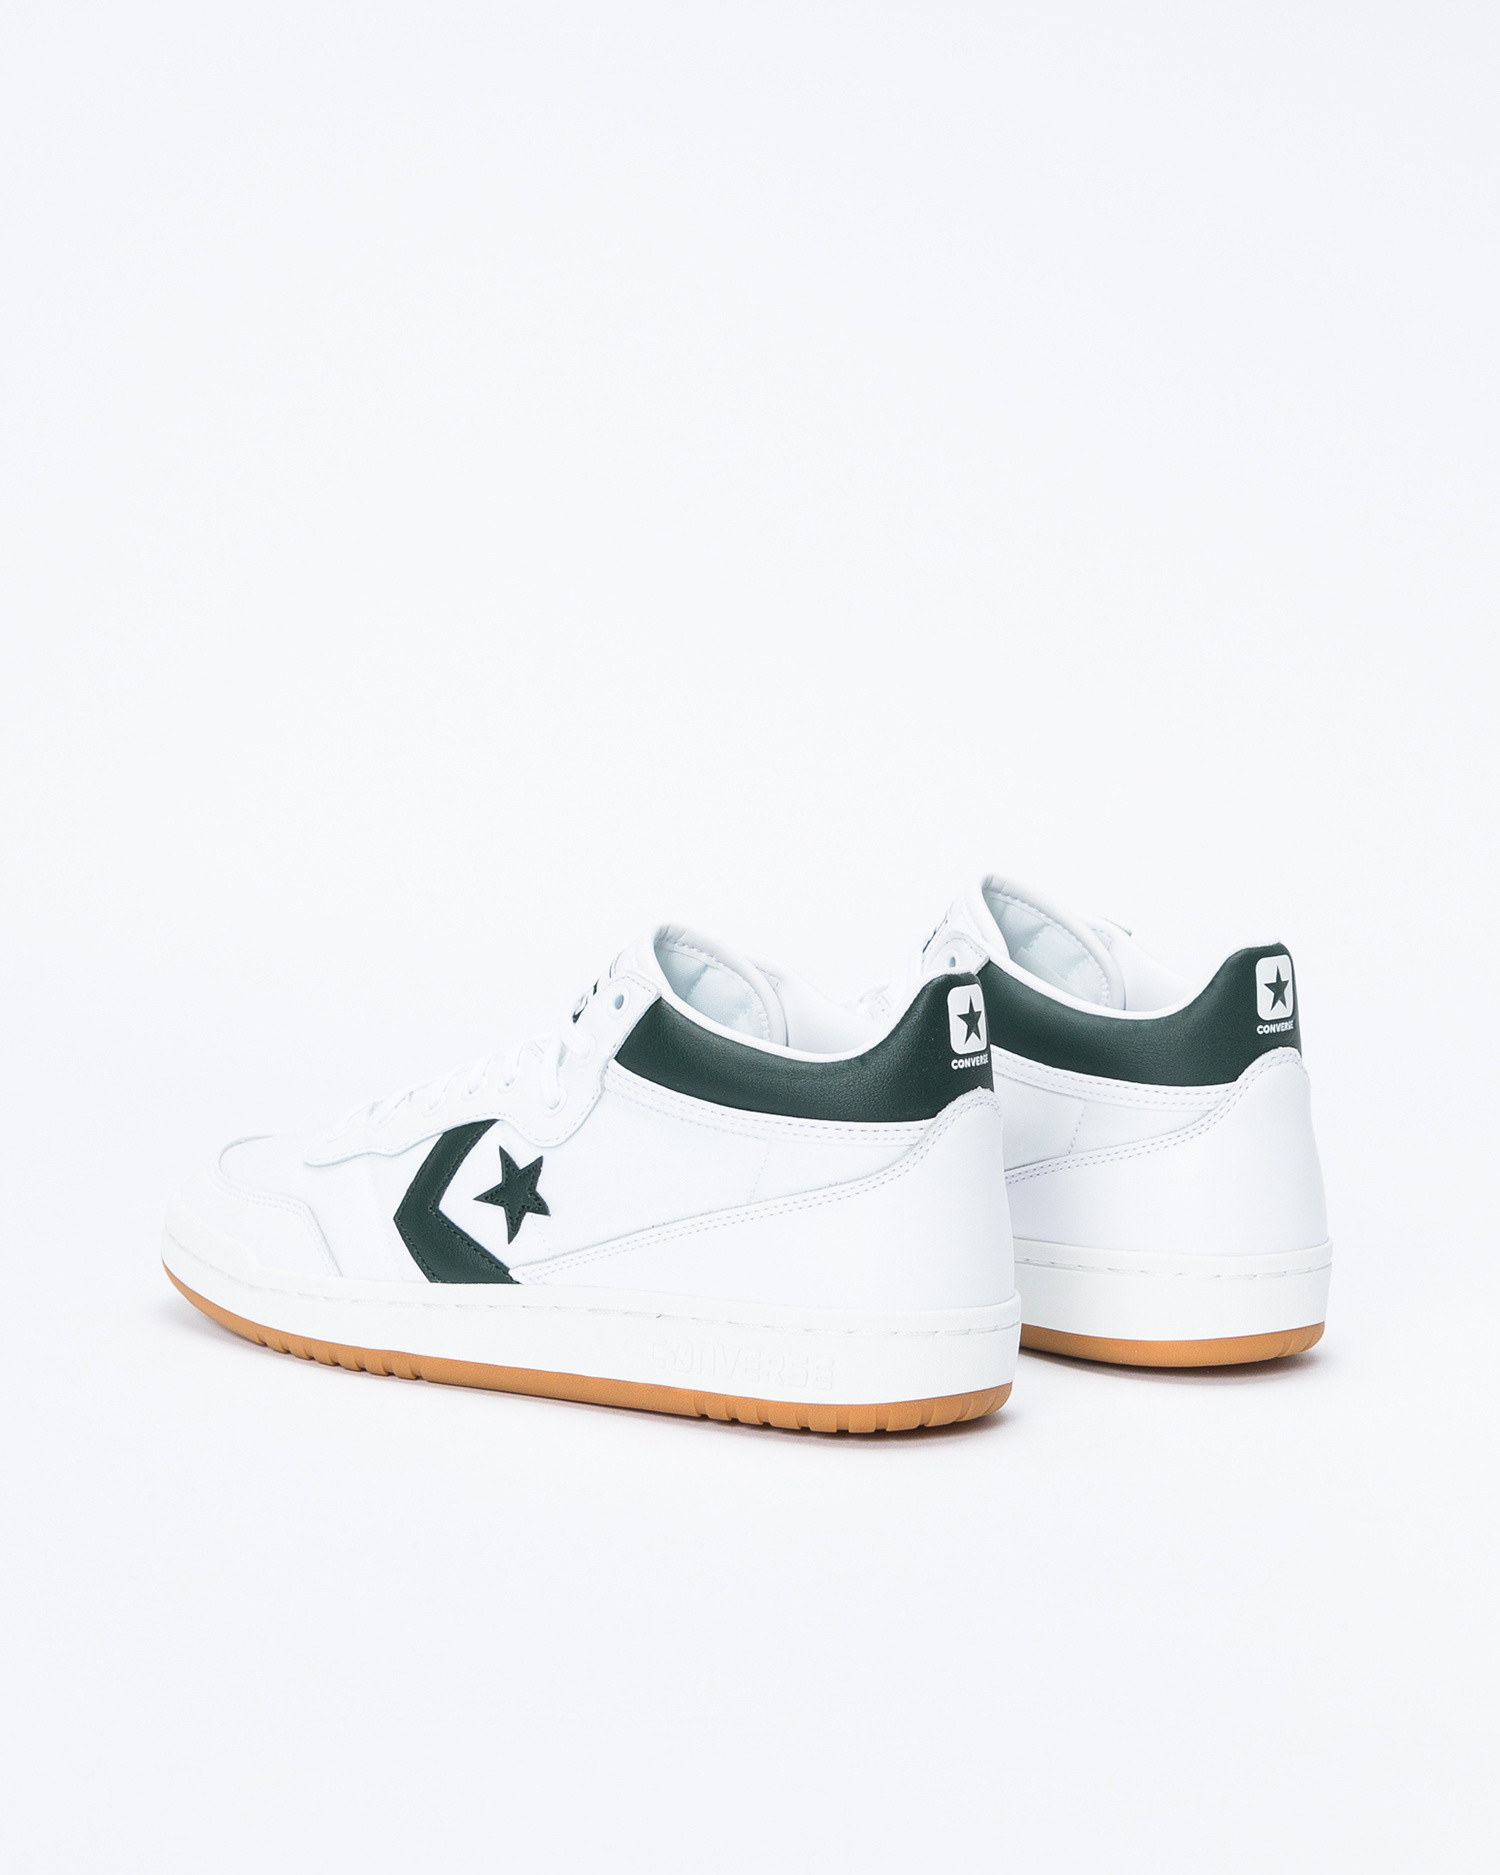 Converse Fastbreak Pro Mid White/Deep Emerald/Gum